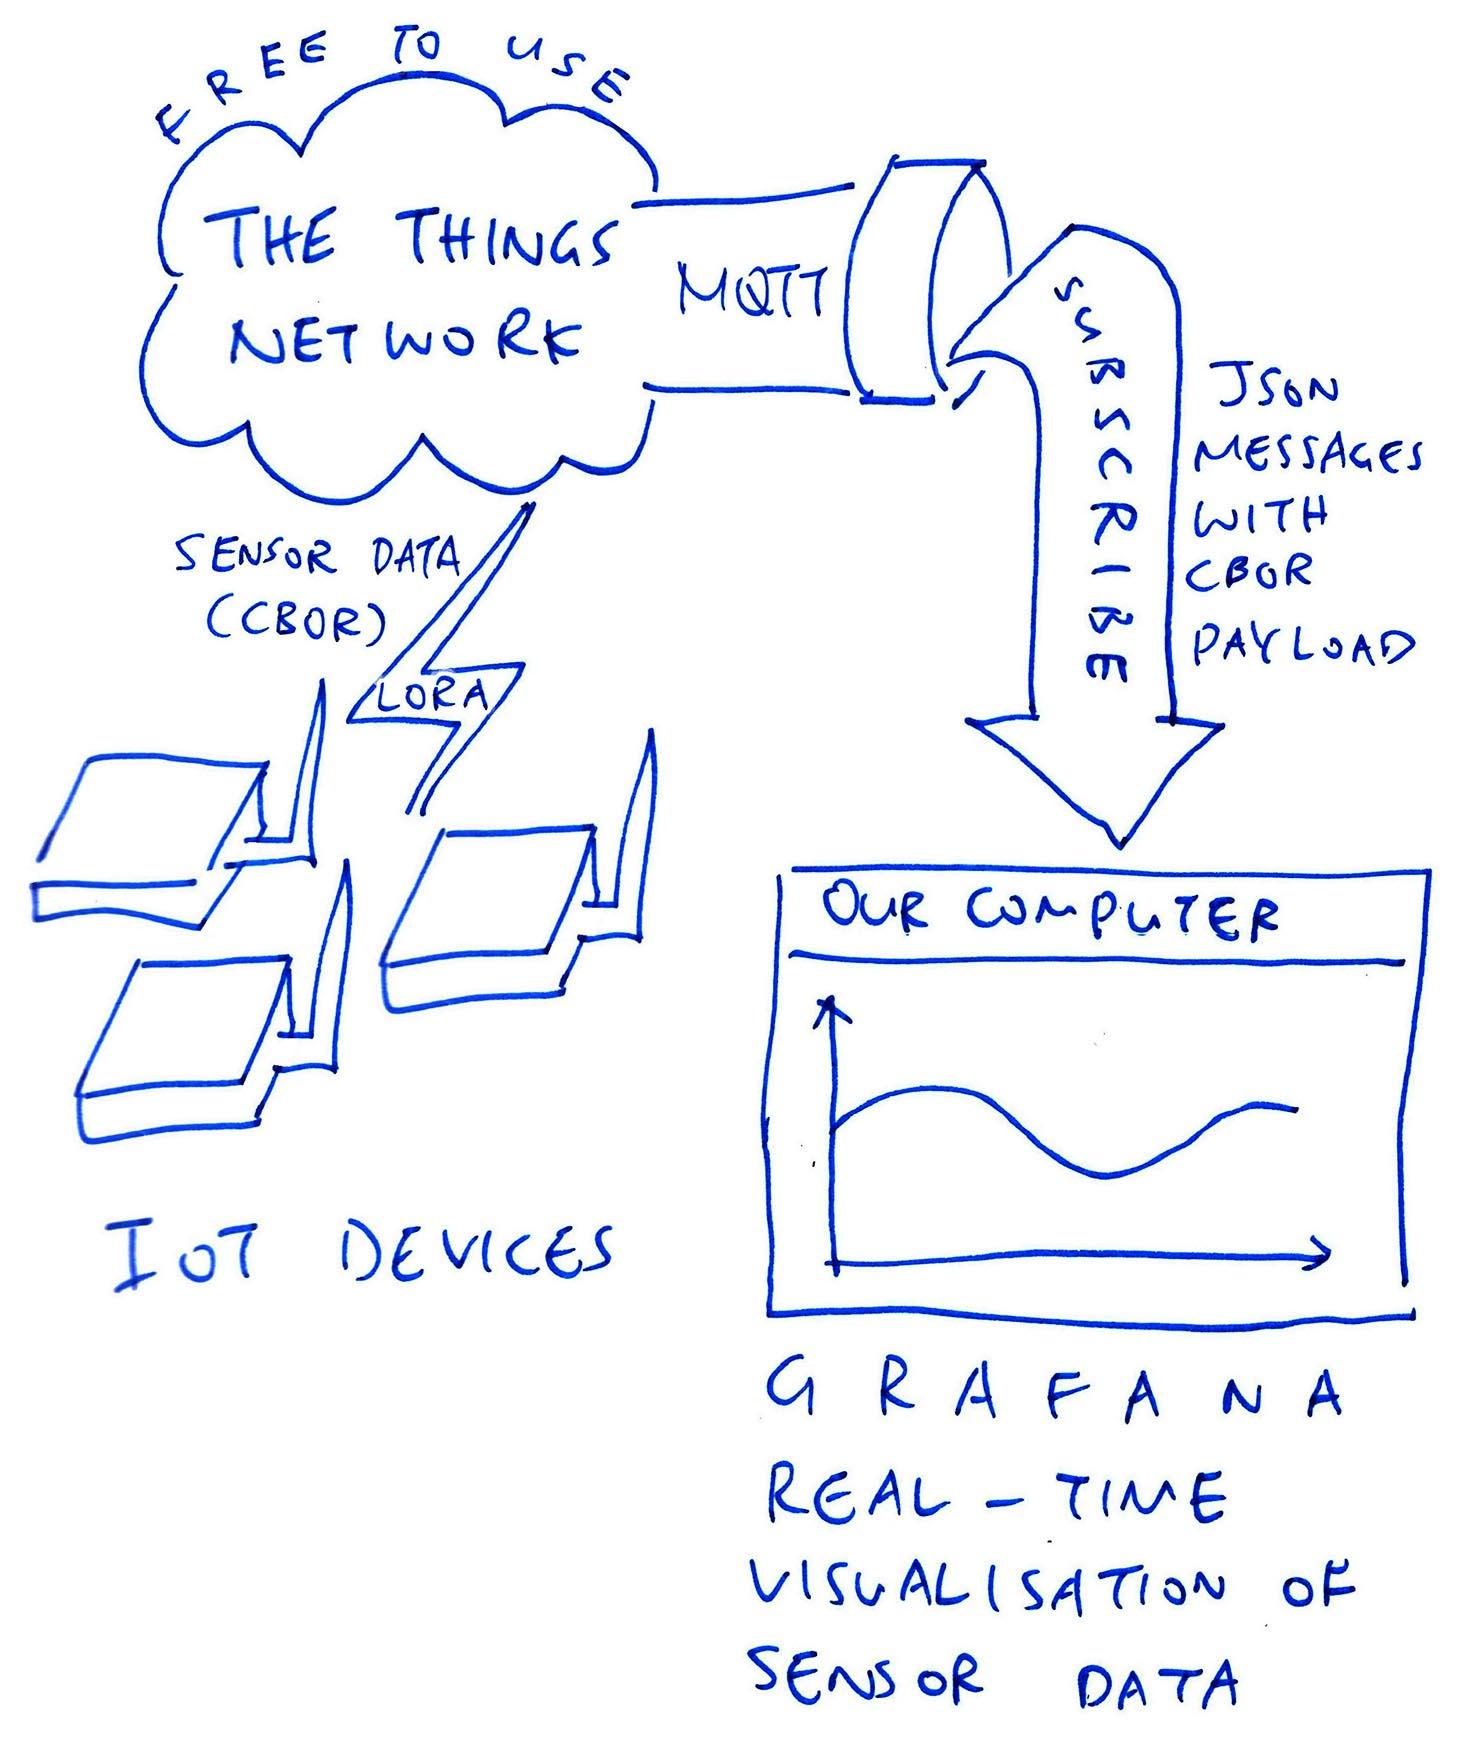 Visualising The Things Network Sensor Data with Grafana